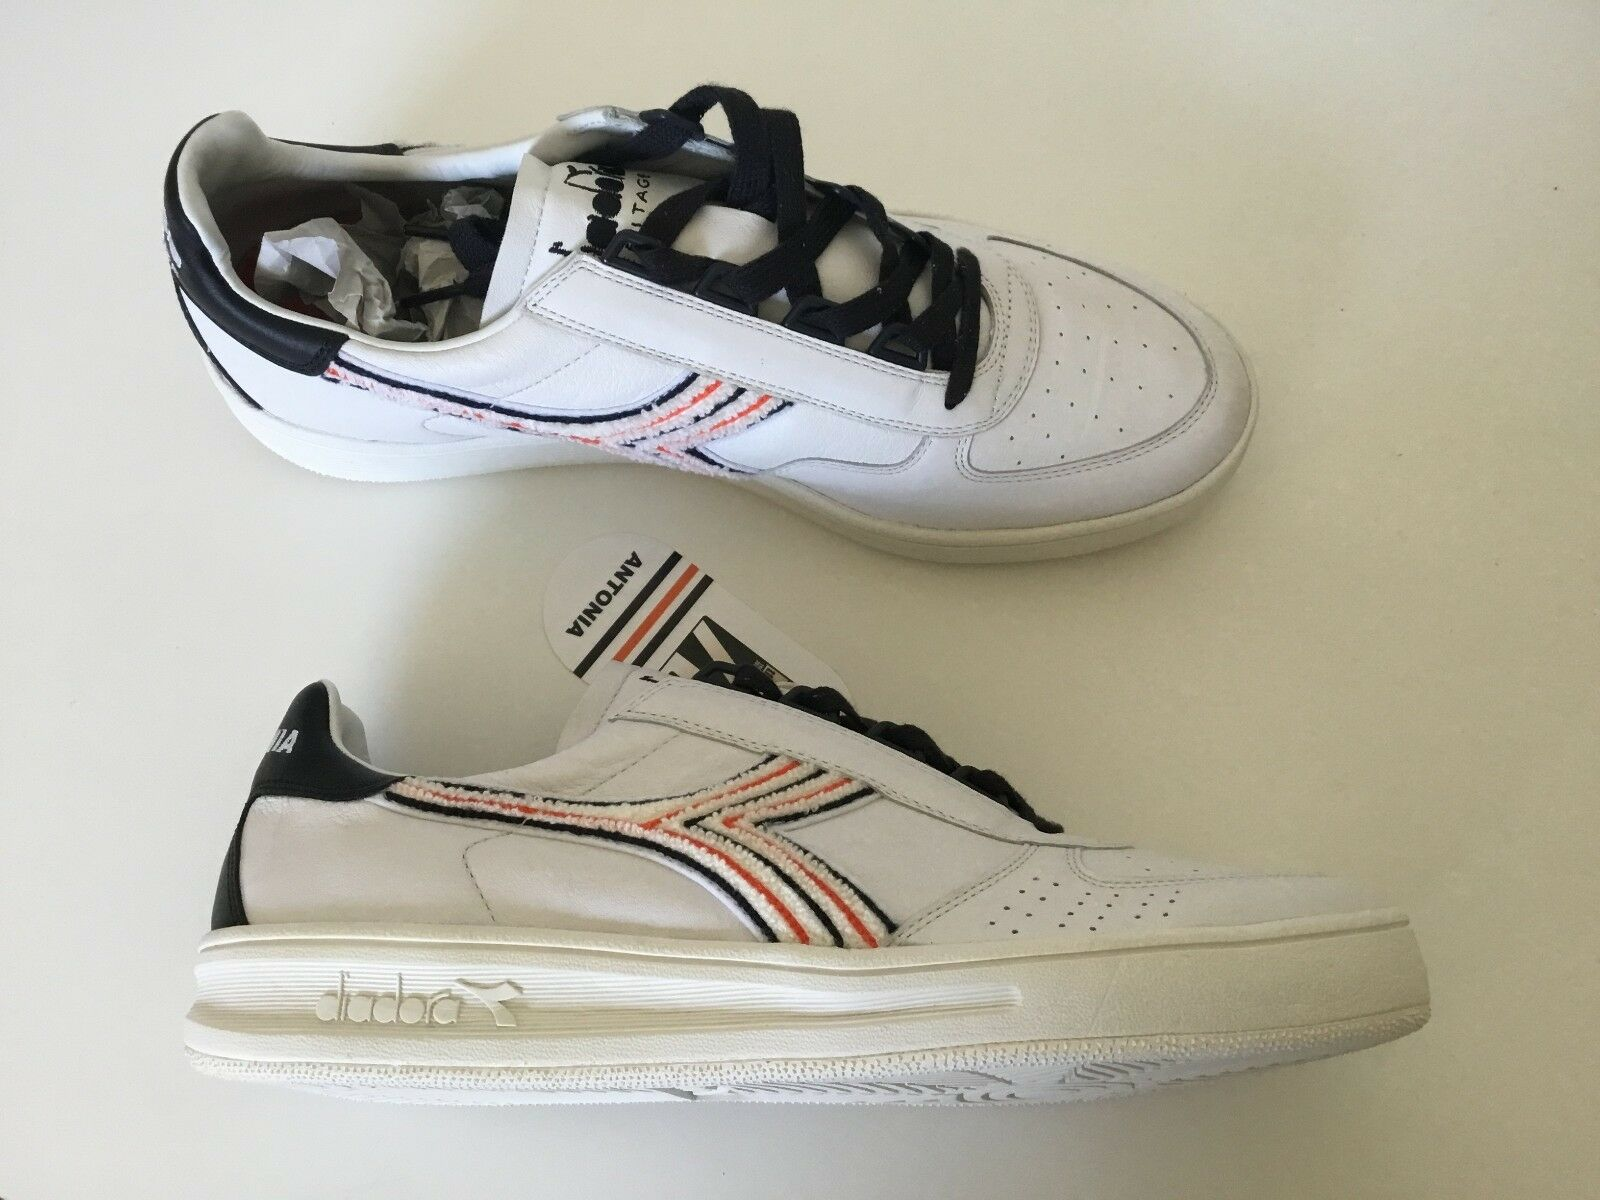 Diadora Antonia B. Elite Made in ITALY Men's Shoes Sneakers White Leather 7